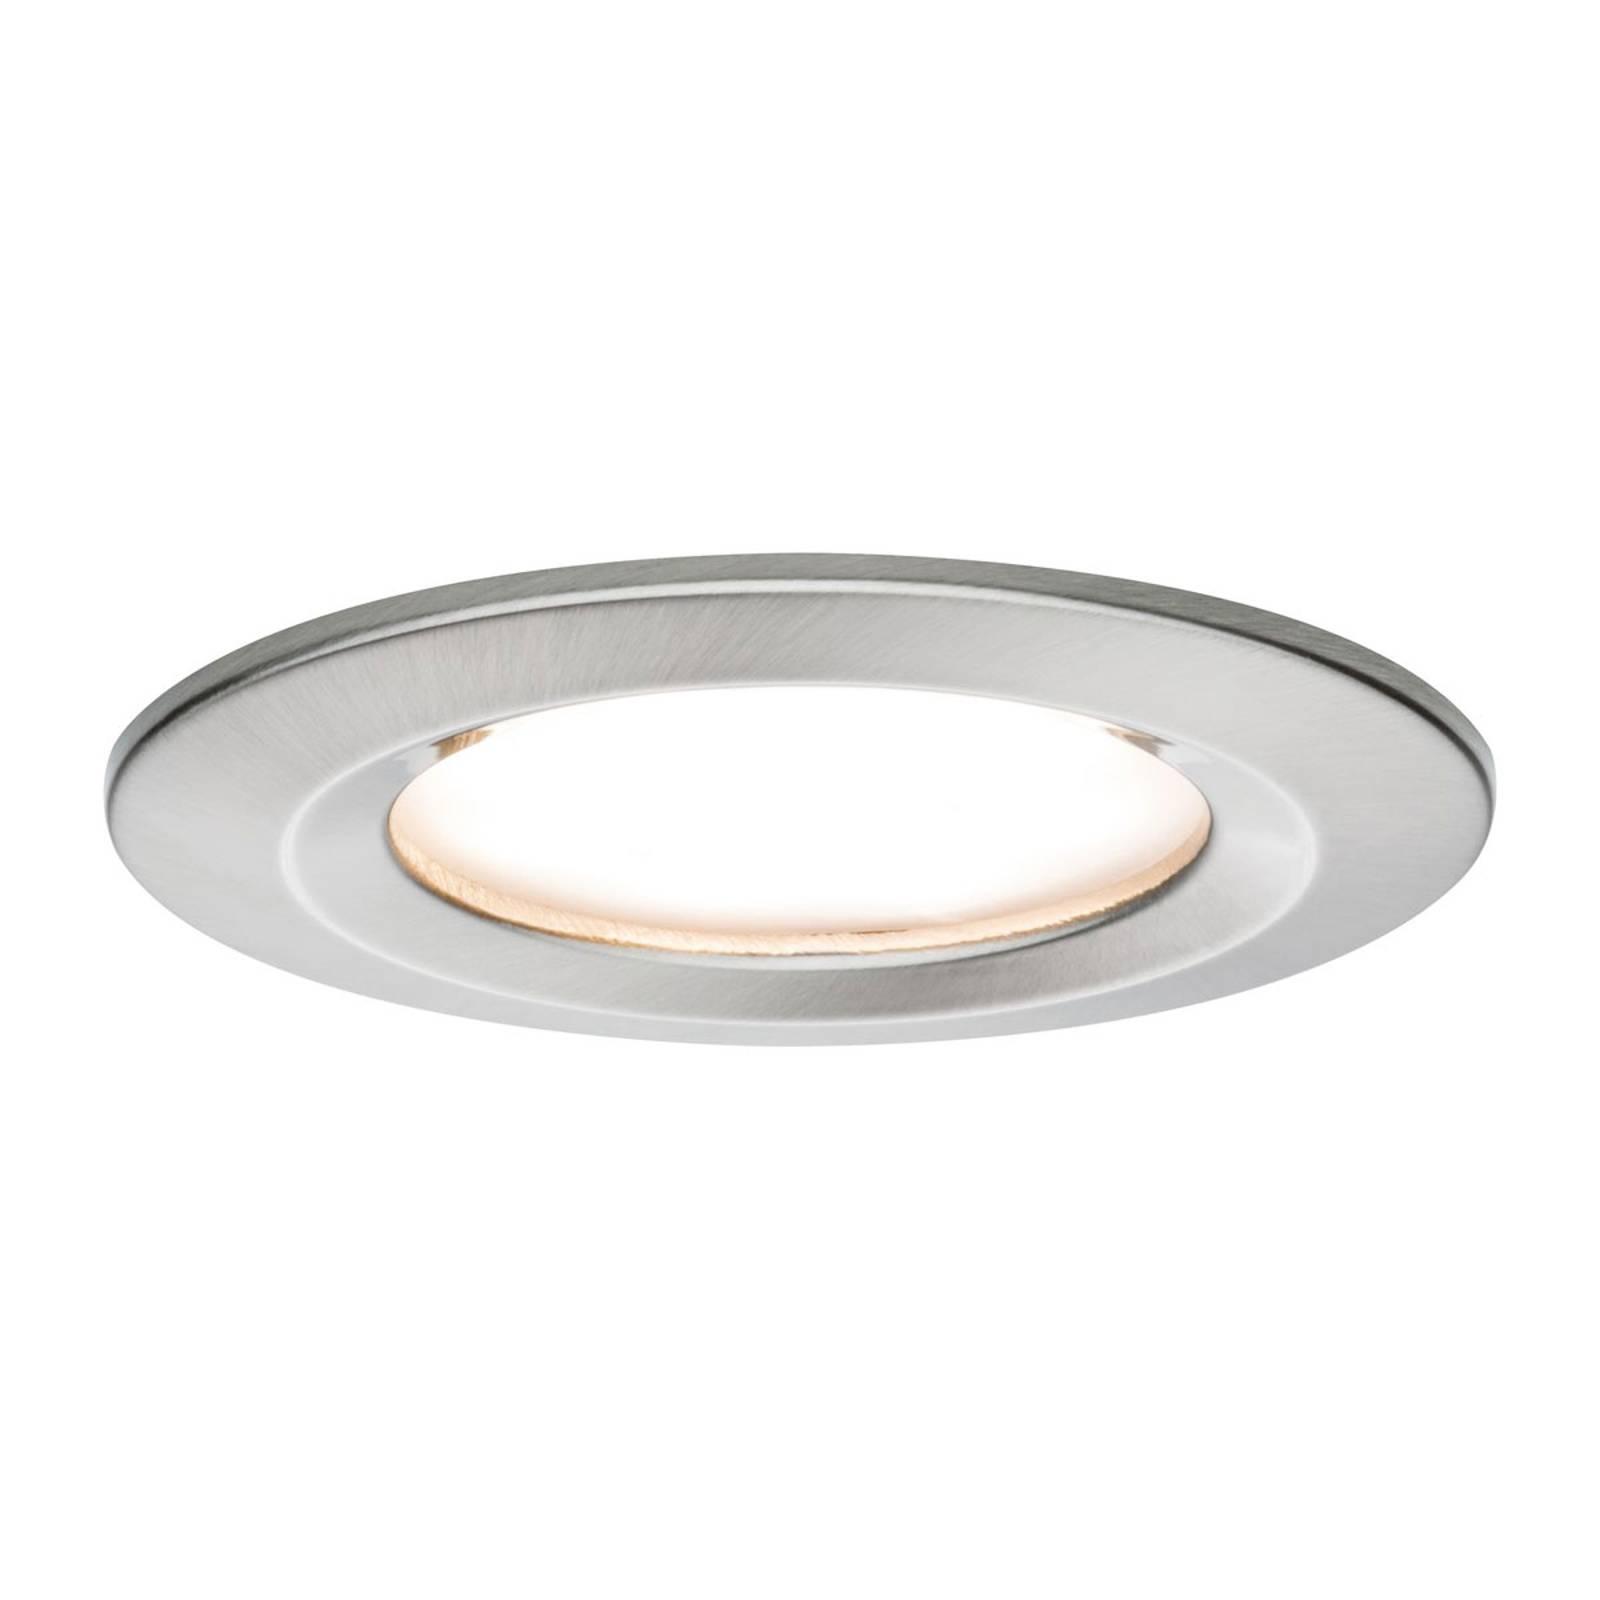 Paulmann LED-spotti Nova Coin pyöreä, rauta